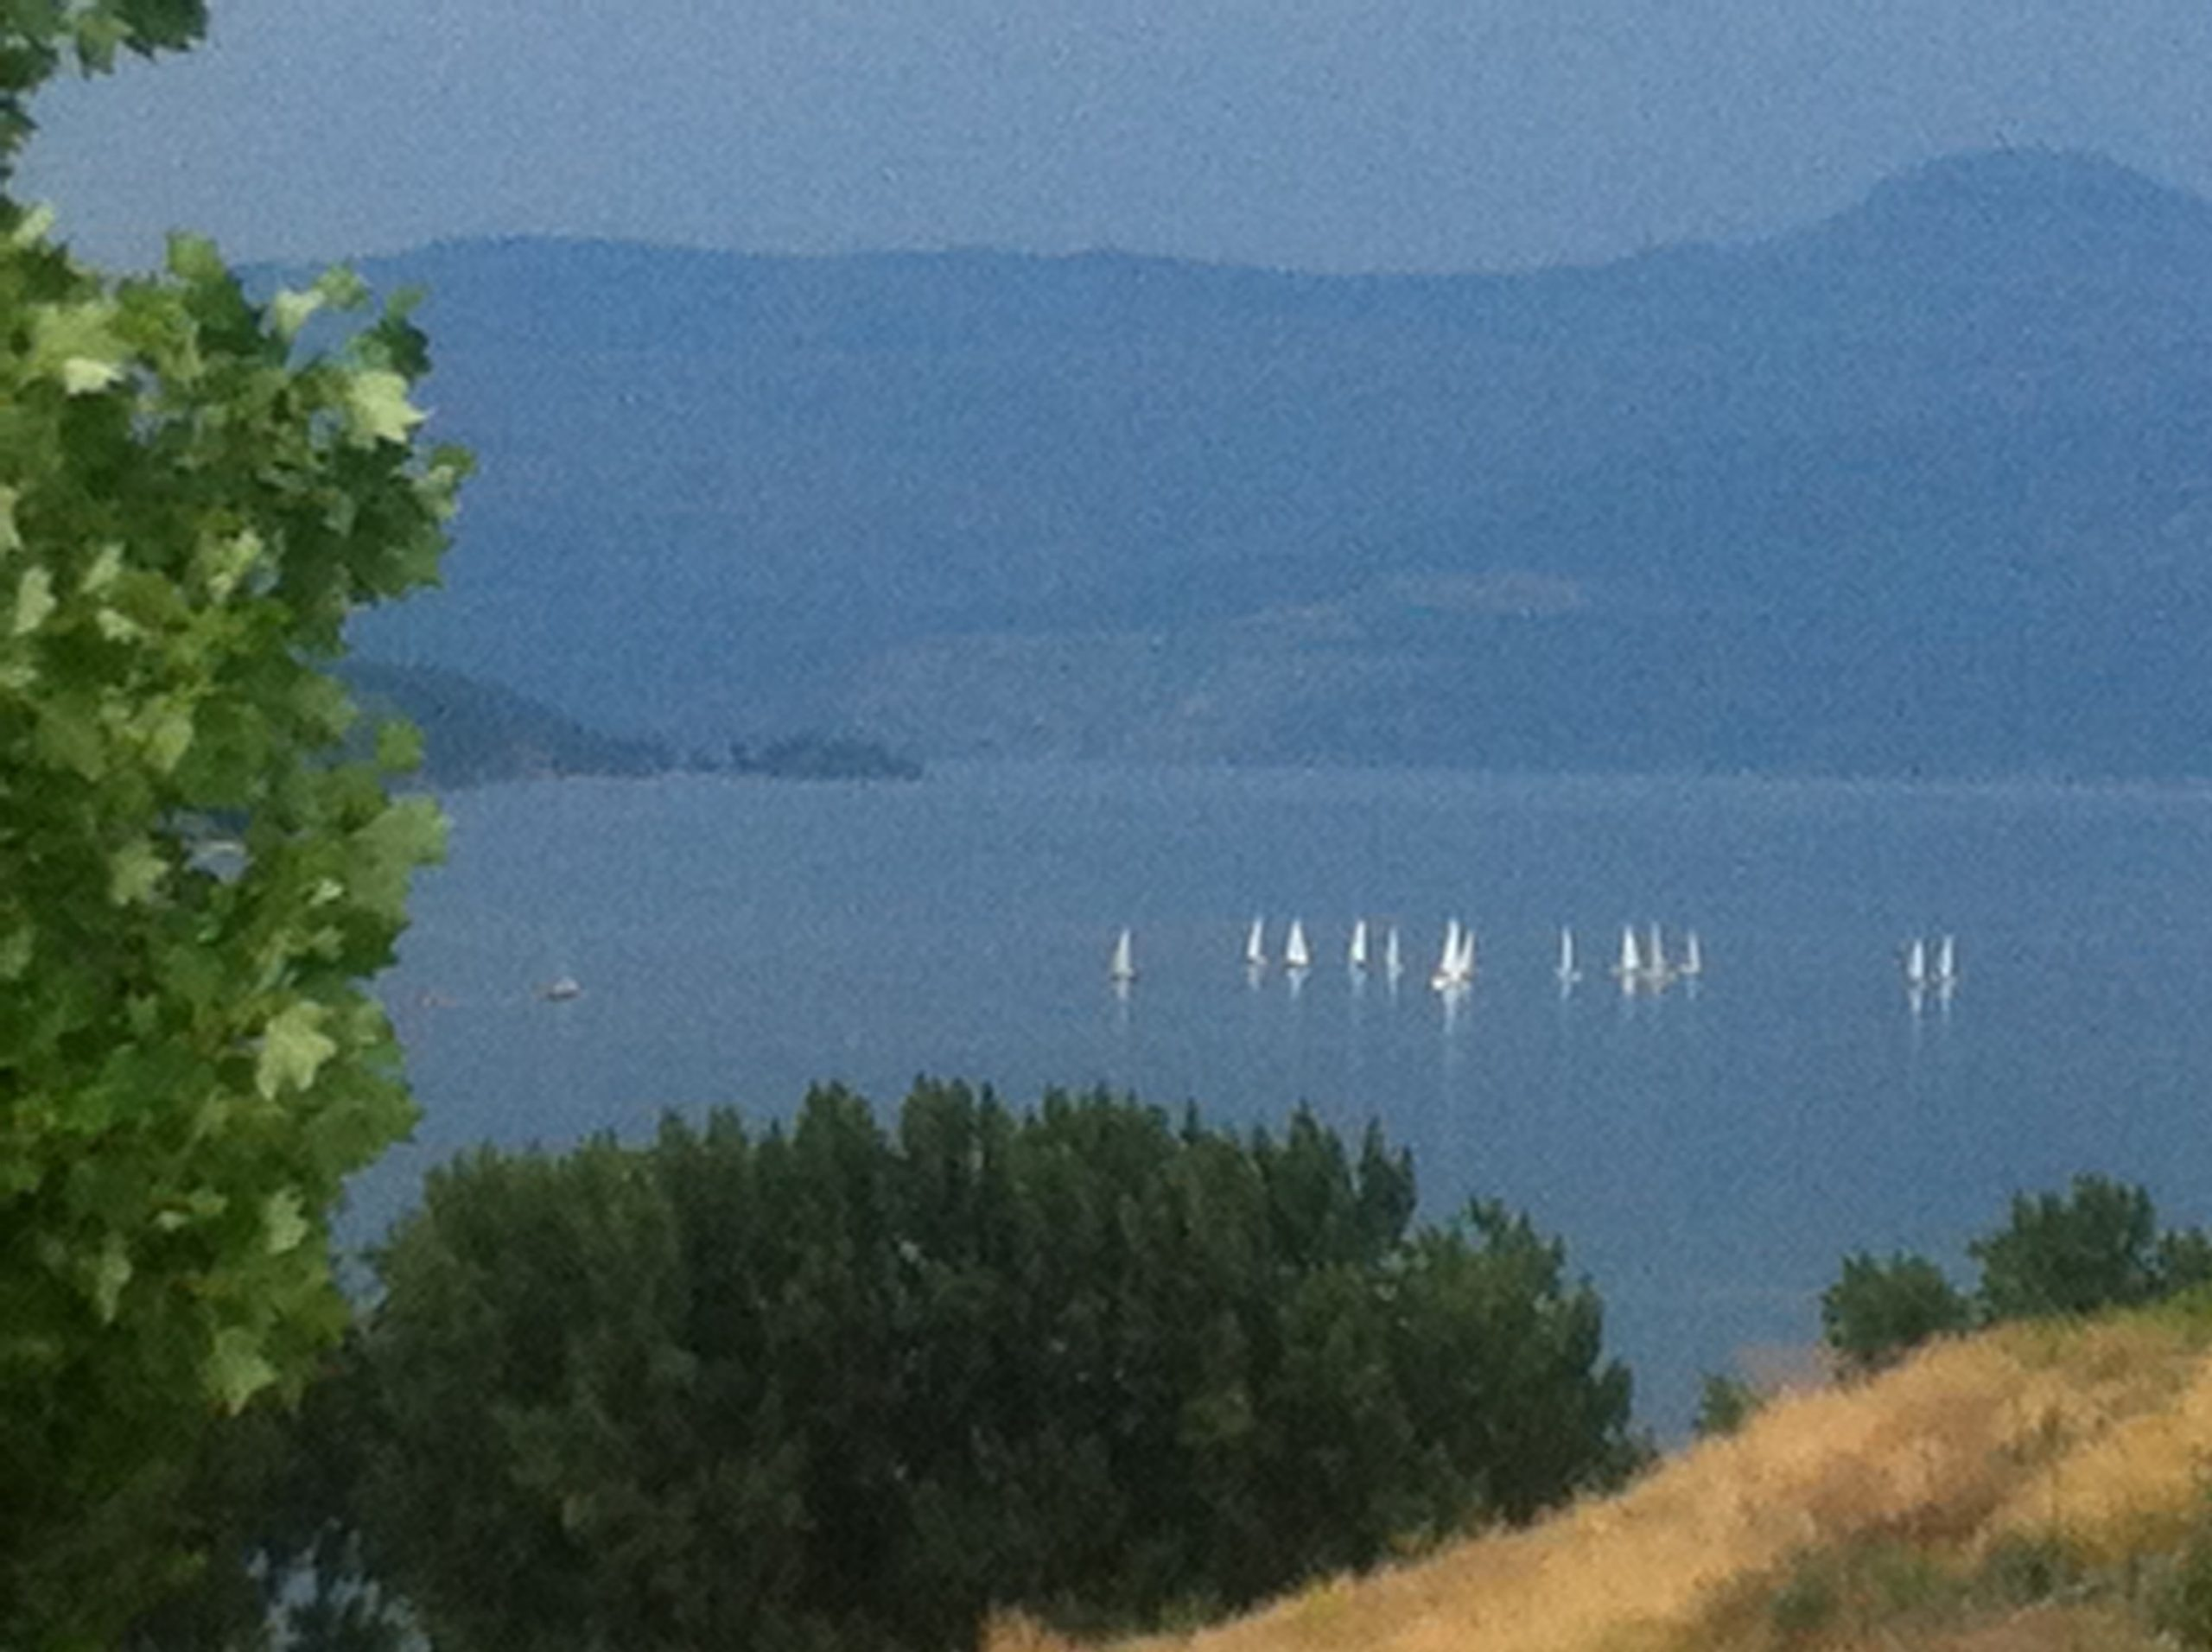 Microgreens farm in Vernon - view from the Okanagan Lake